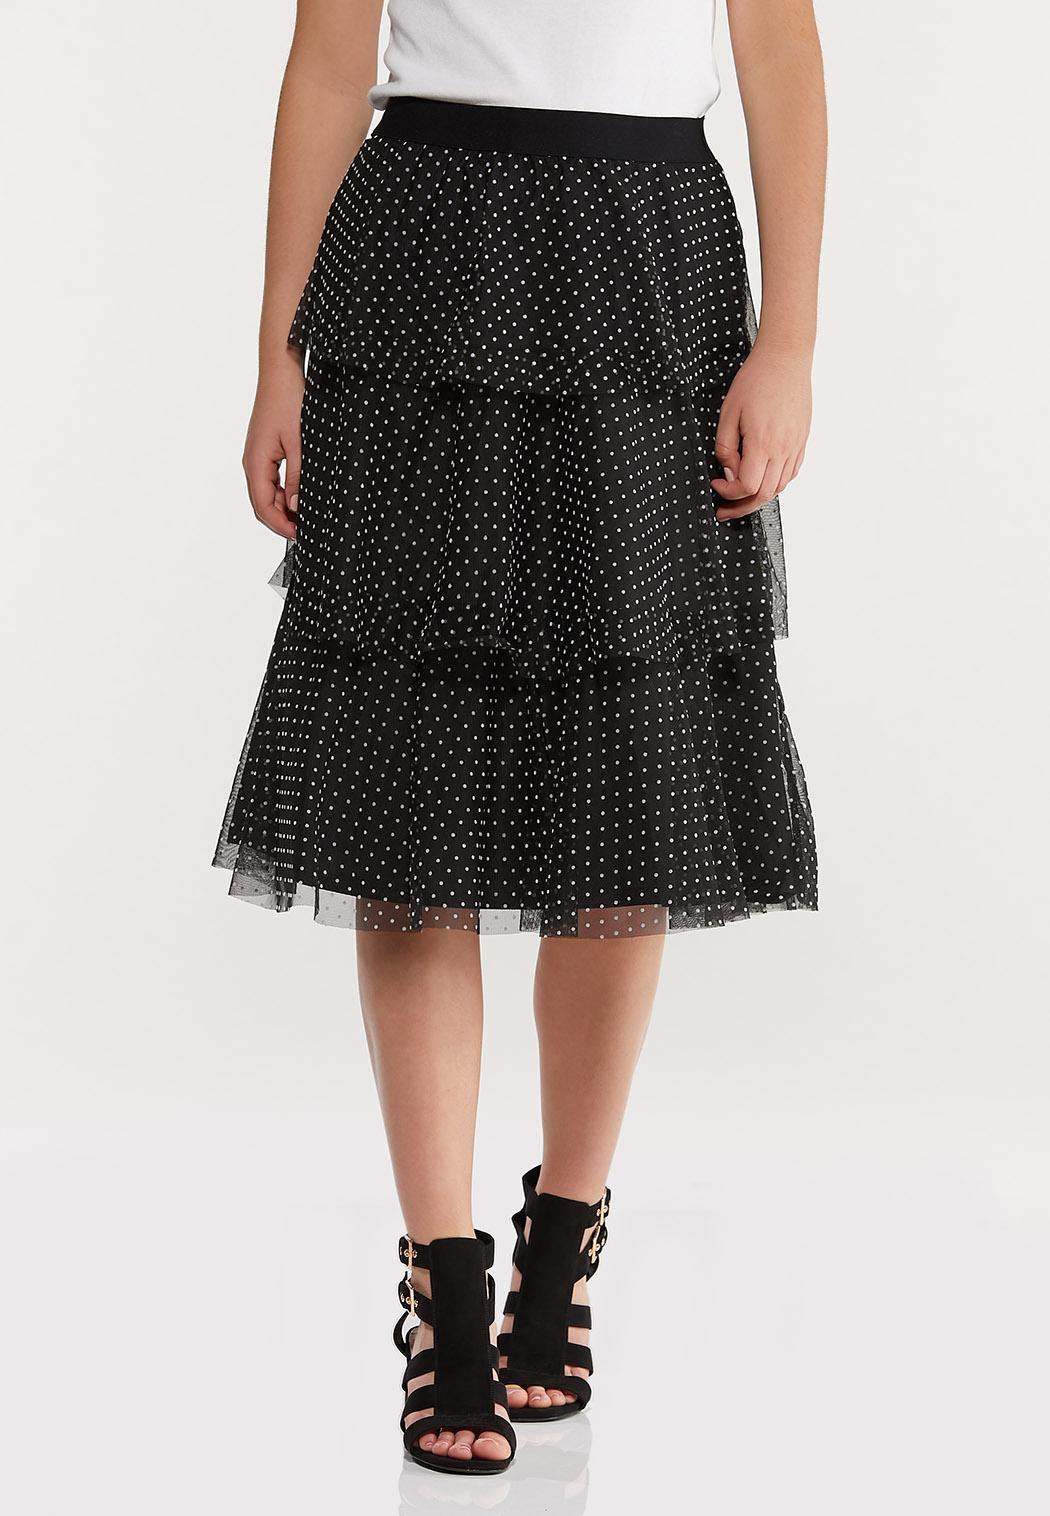 Plus Size Tiered Polka Dot Skirt (Item #44469732)